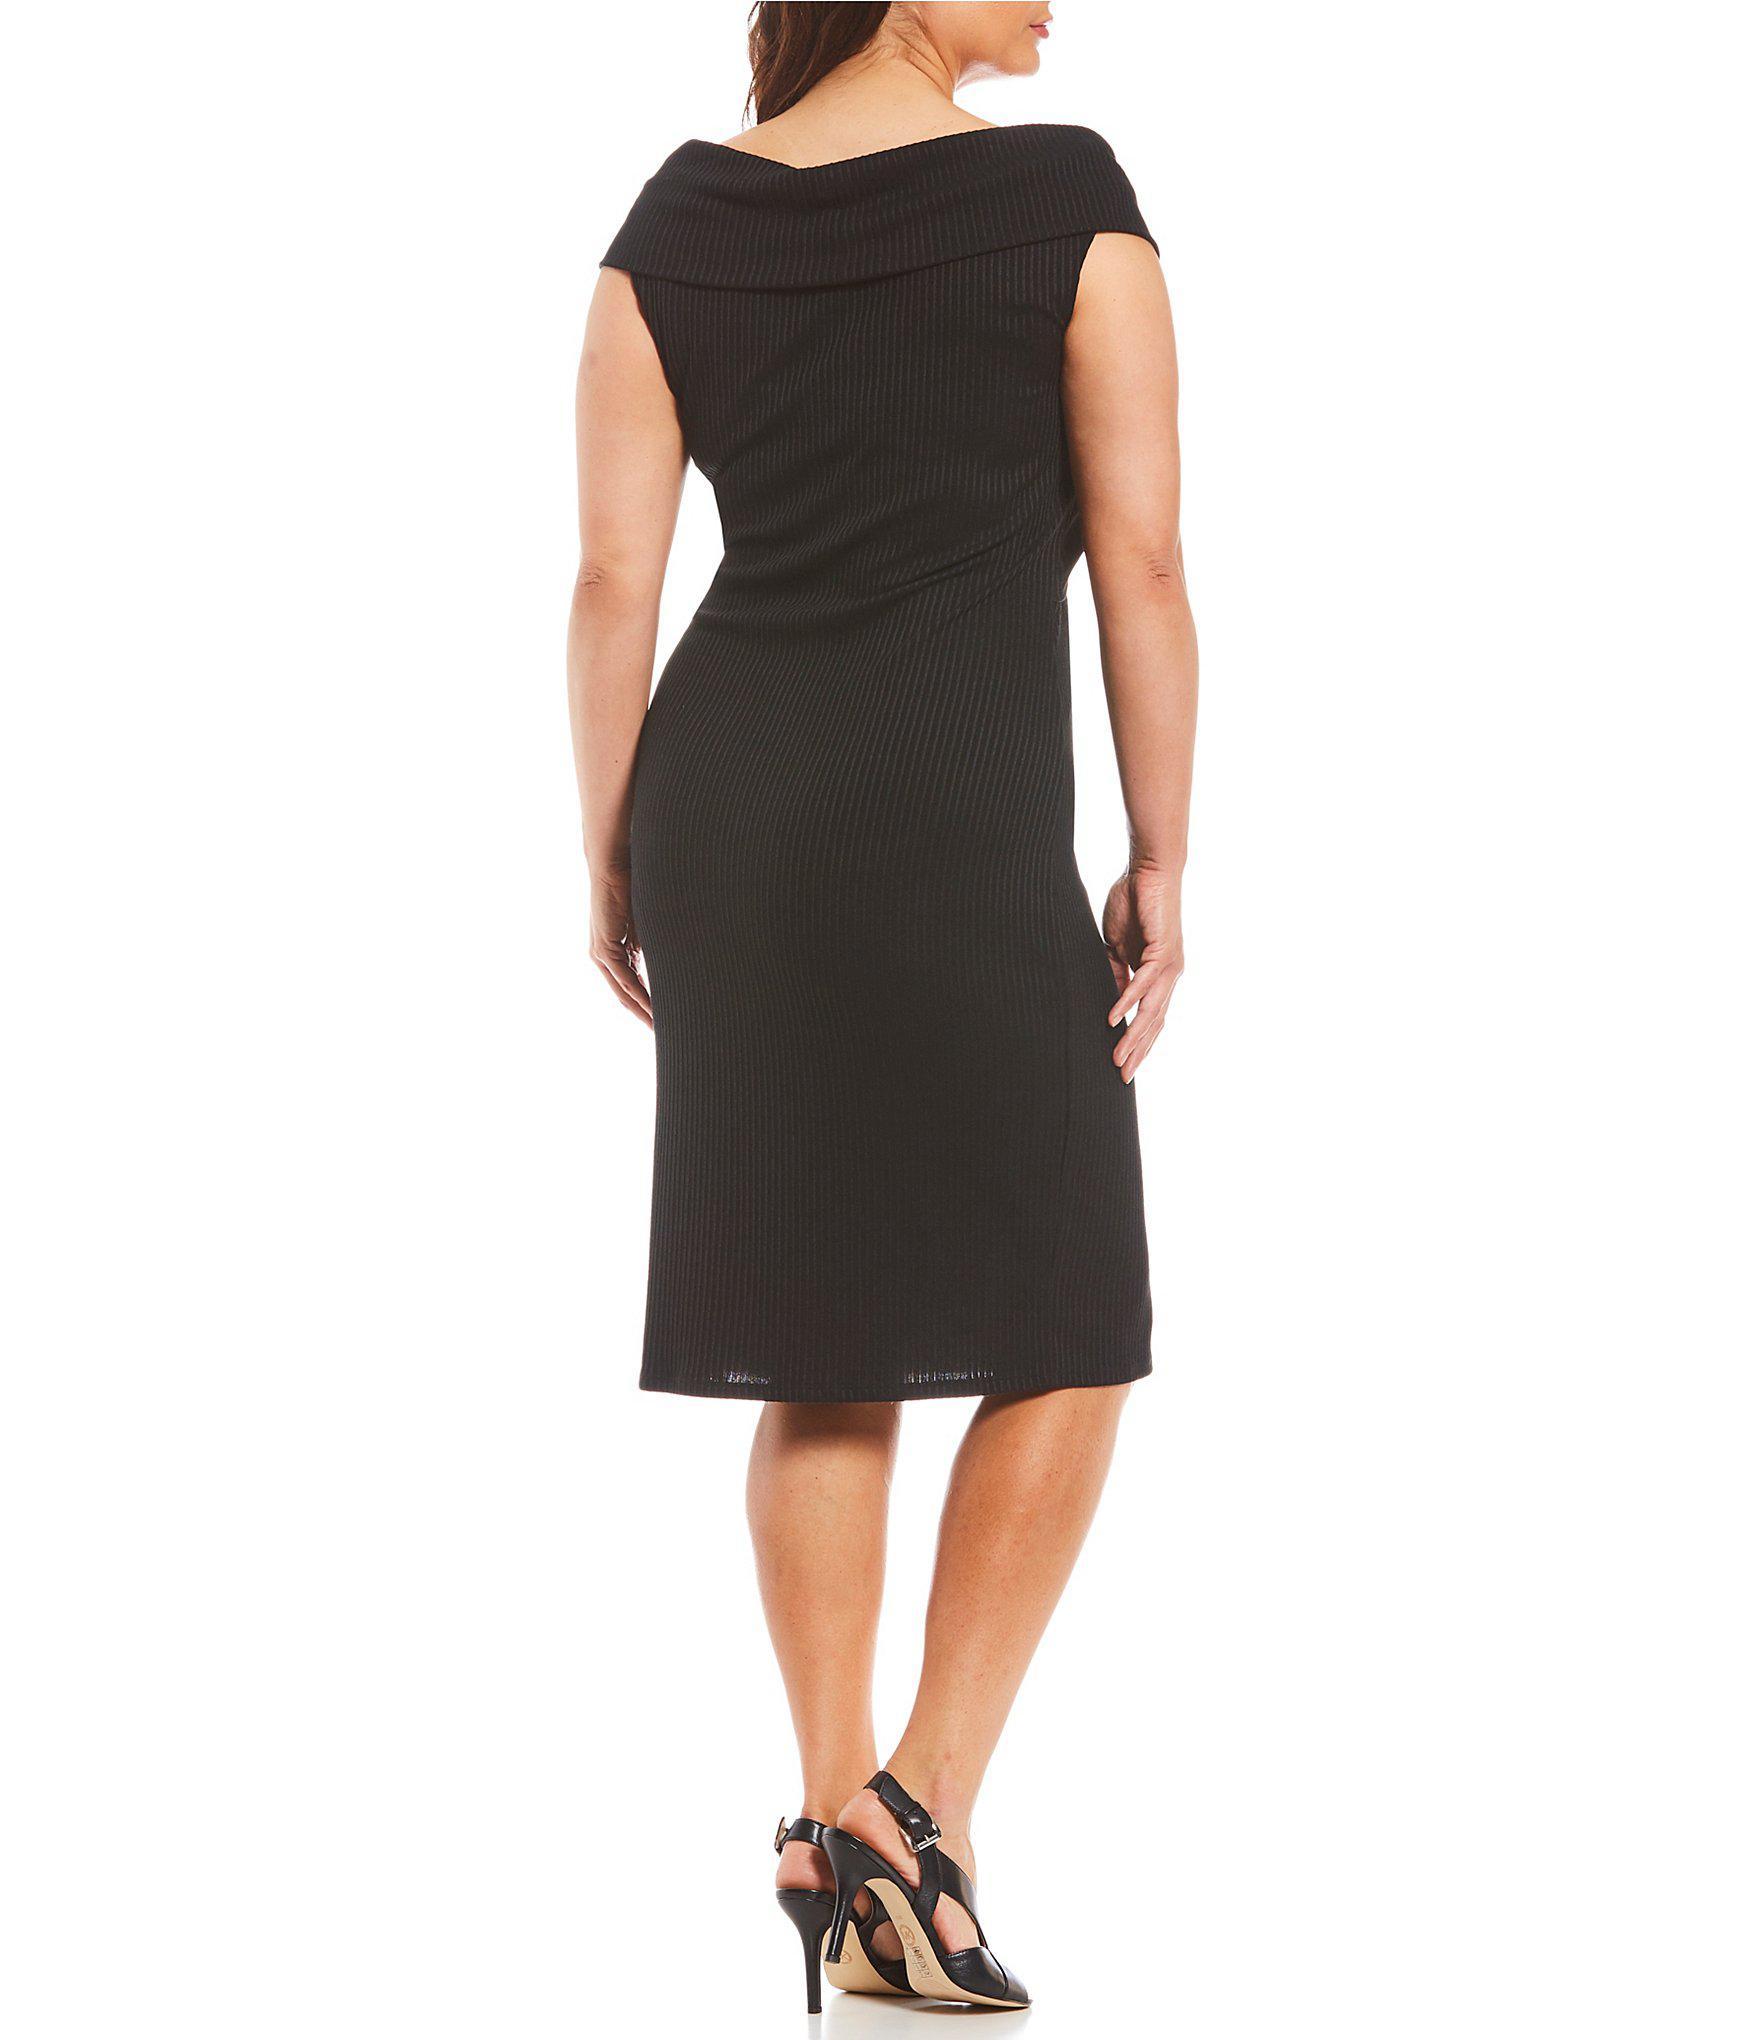 39e2a89ca22ae MICHAEL Michael Kors - Black Plus Crossover Portrait Collar Plaited Rib  Knit Sheath Dress - Lyst. View fullscreen